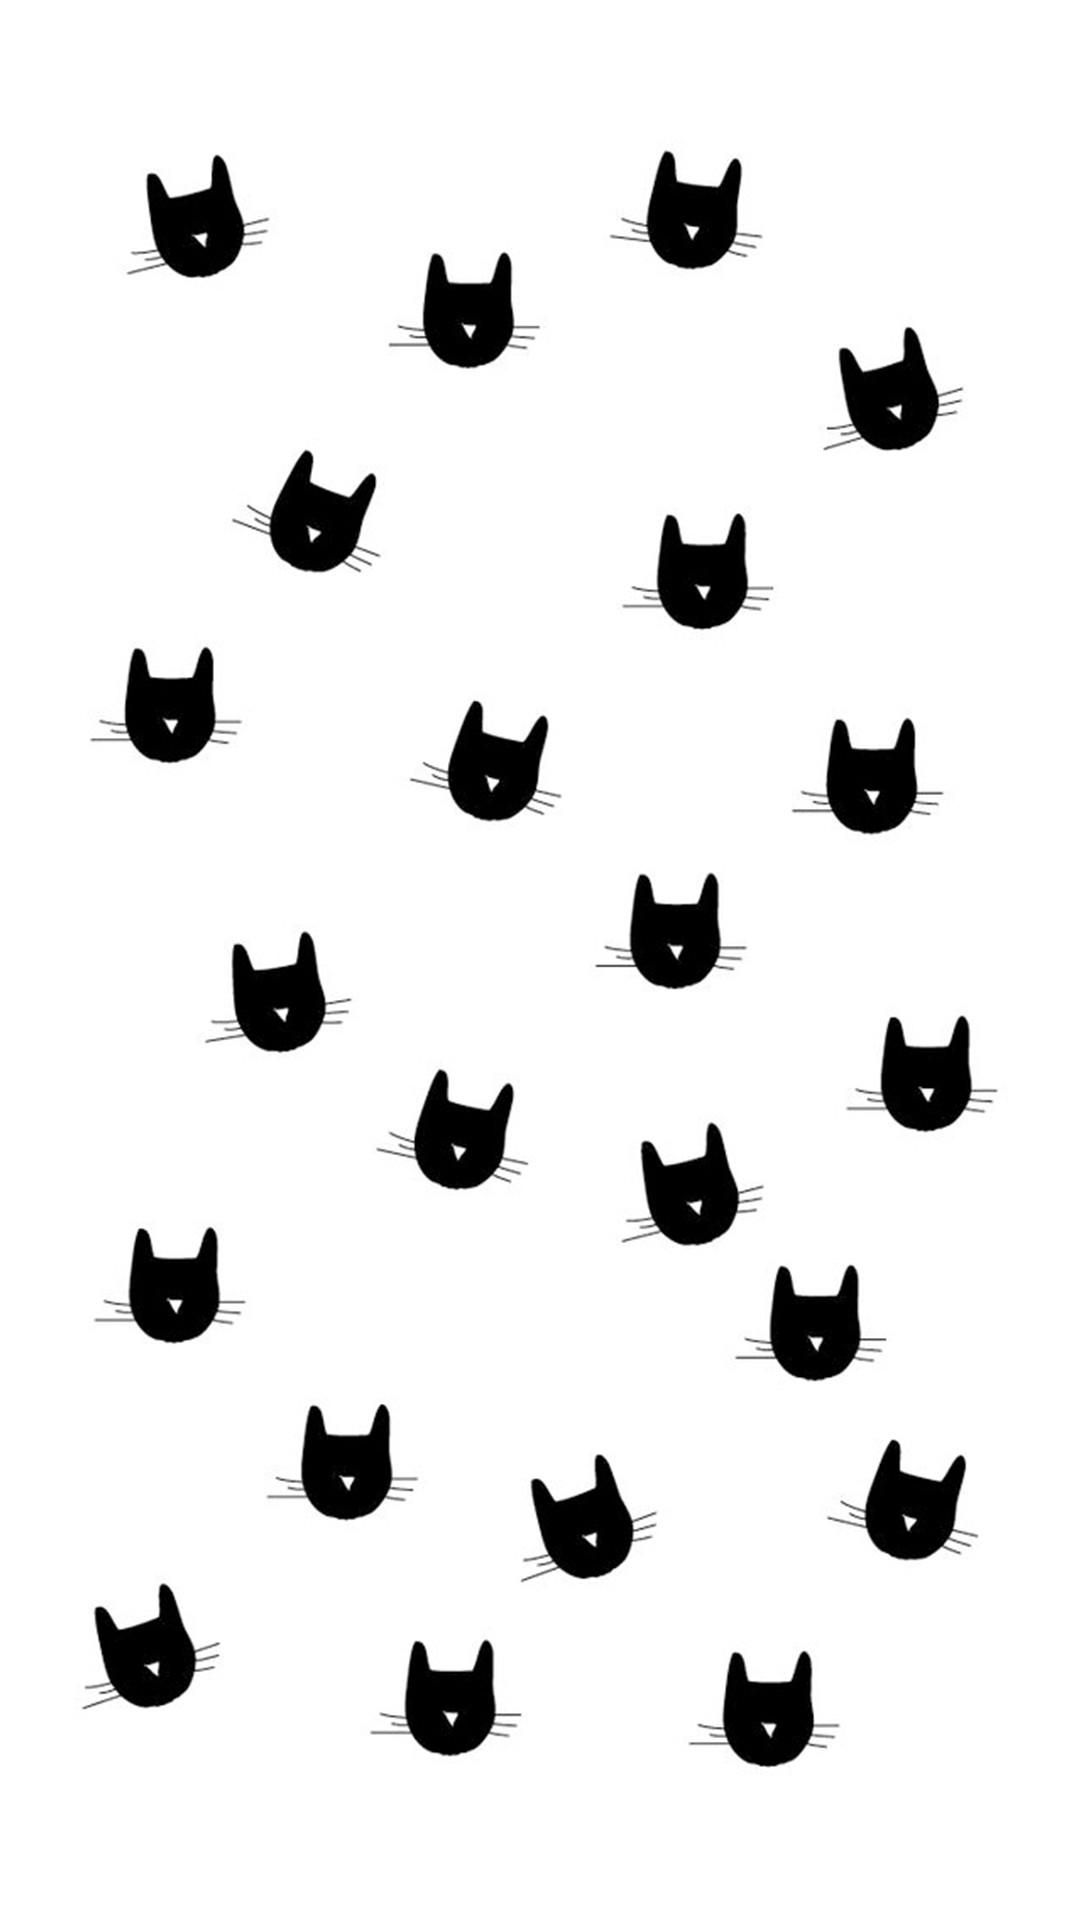 Pusheen The Cat Iphone Wallpaper 54 Images